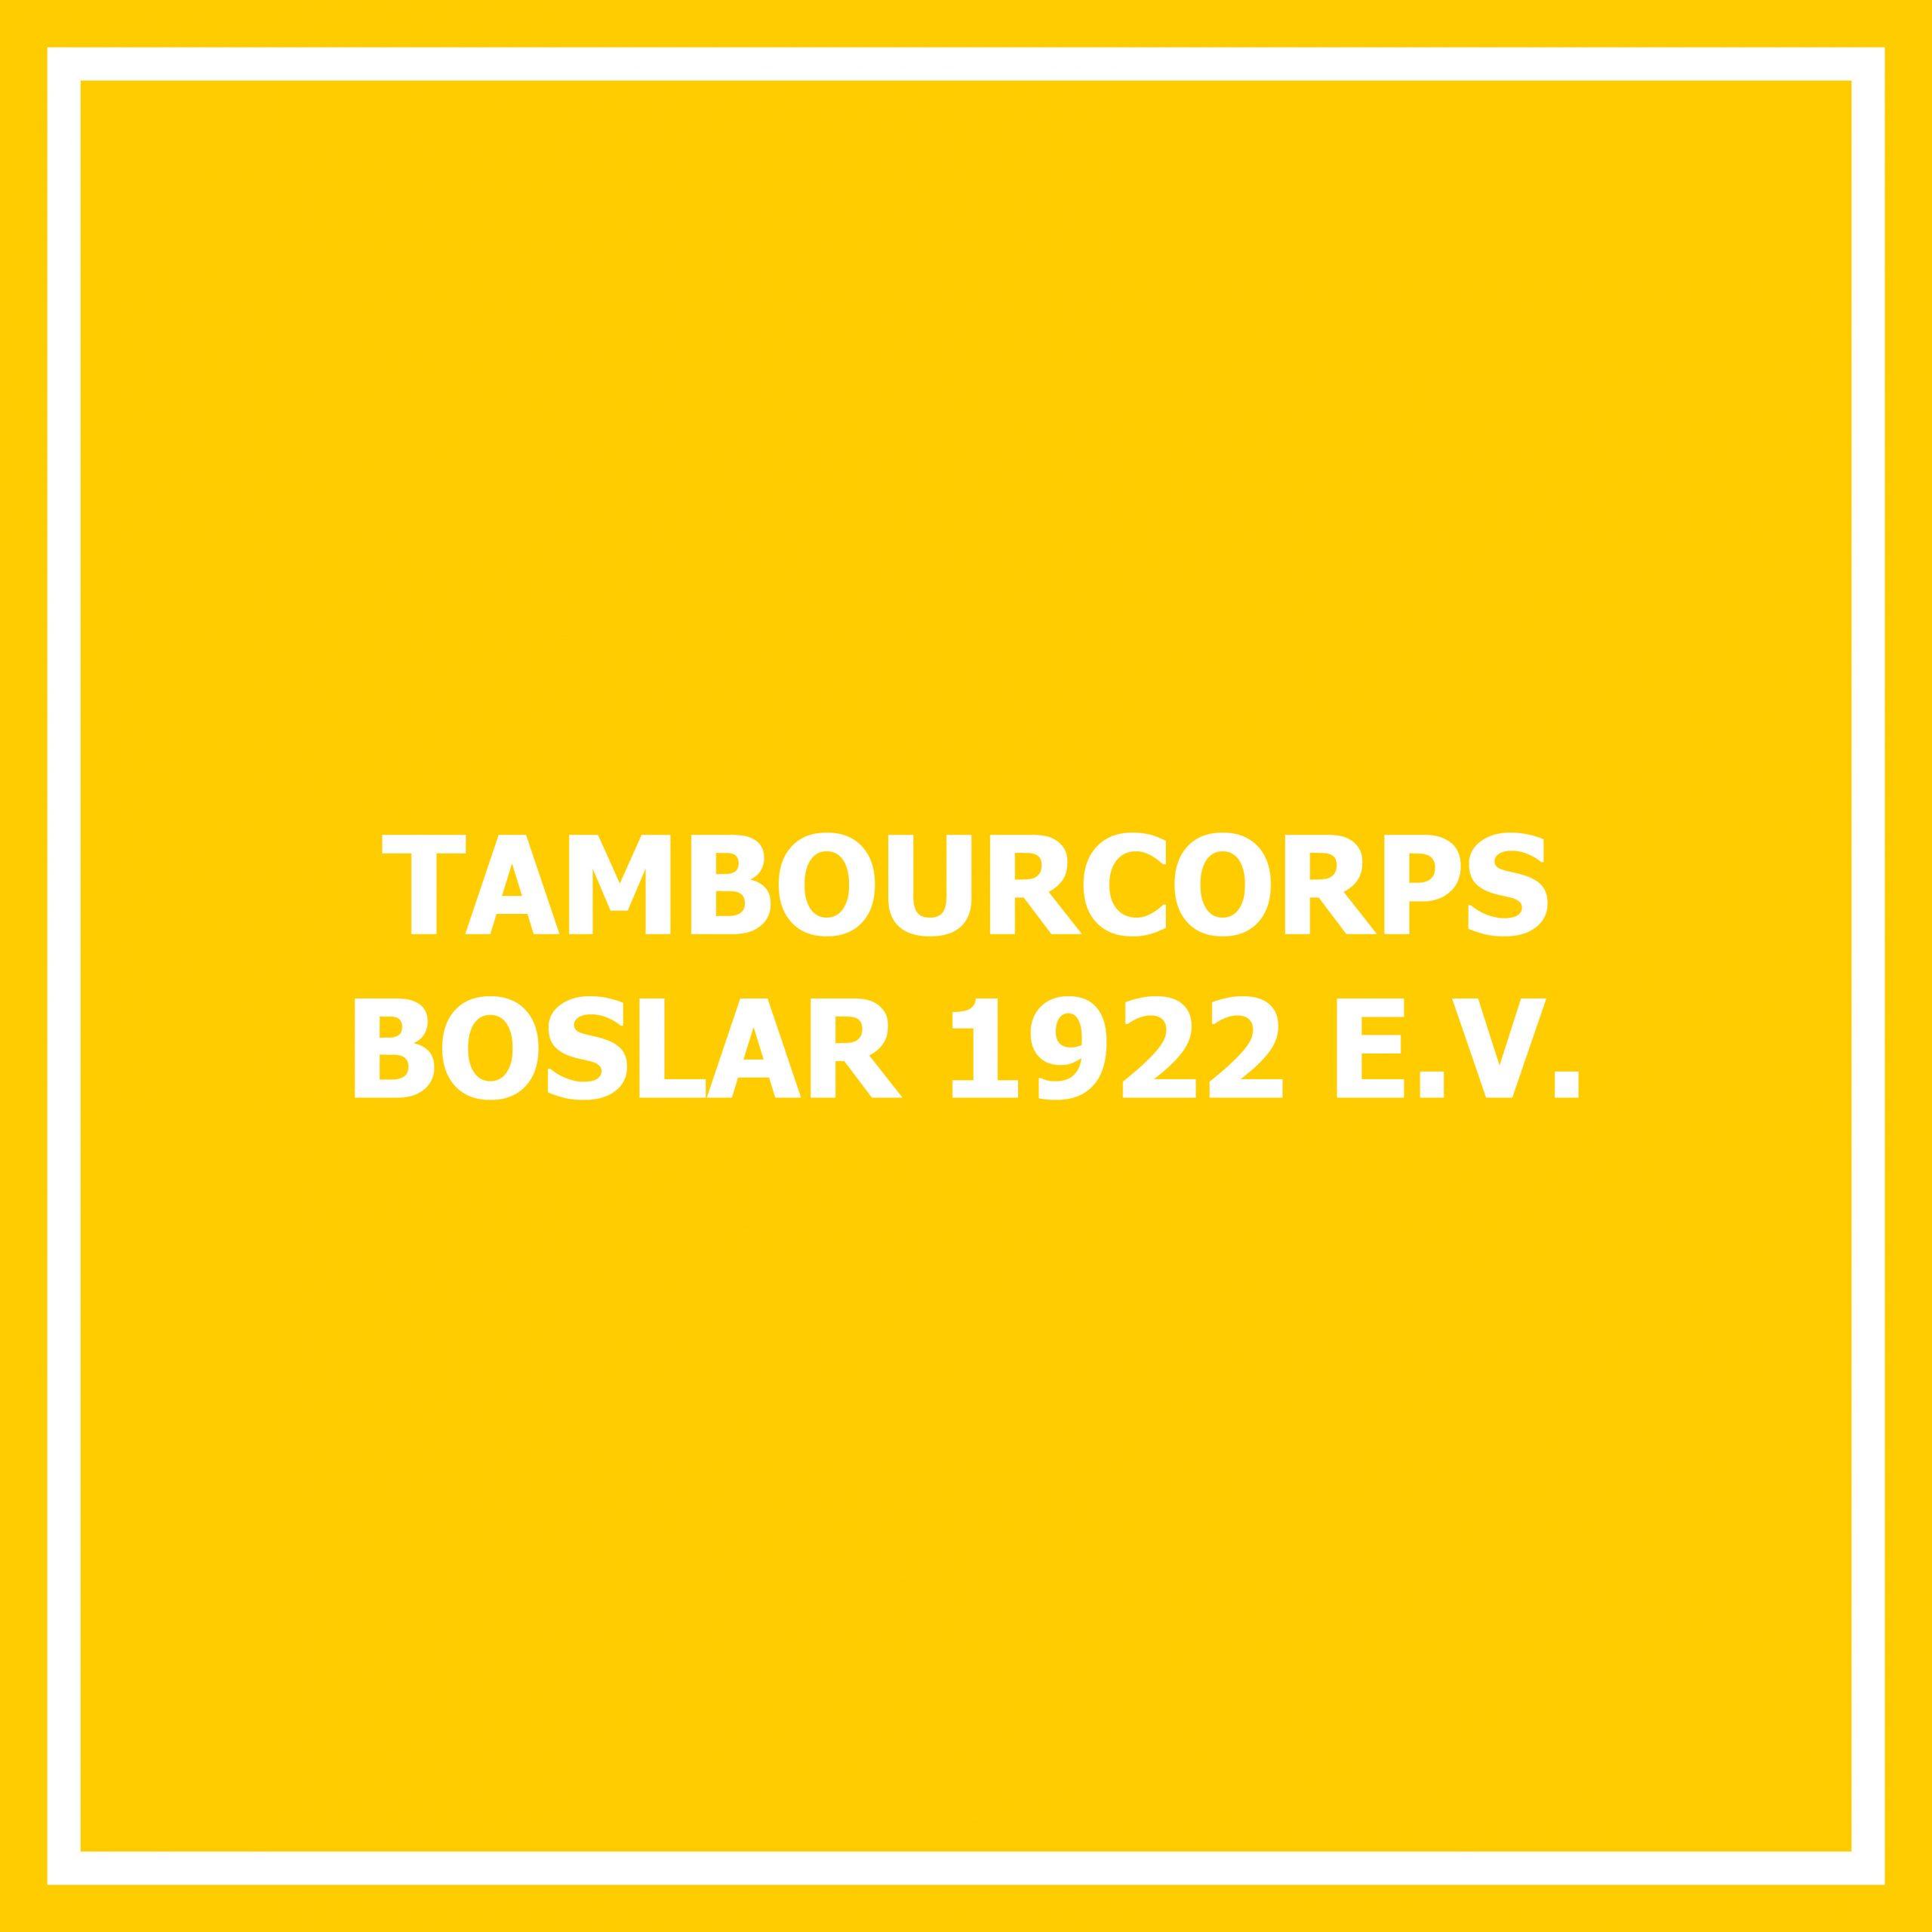 Tambourcorps Boslar 1922 e. V.